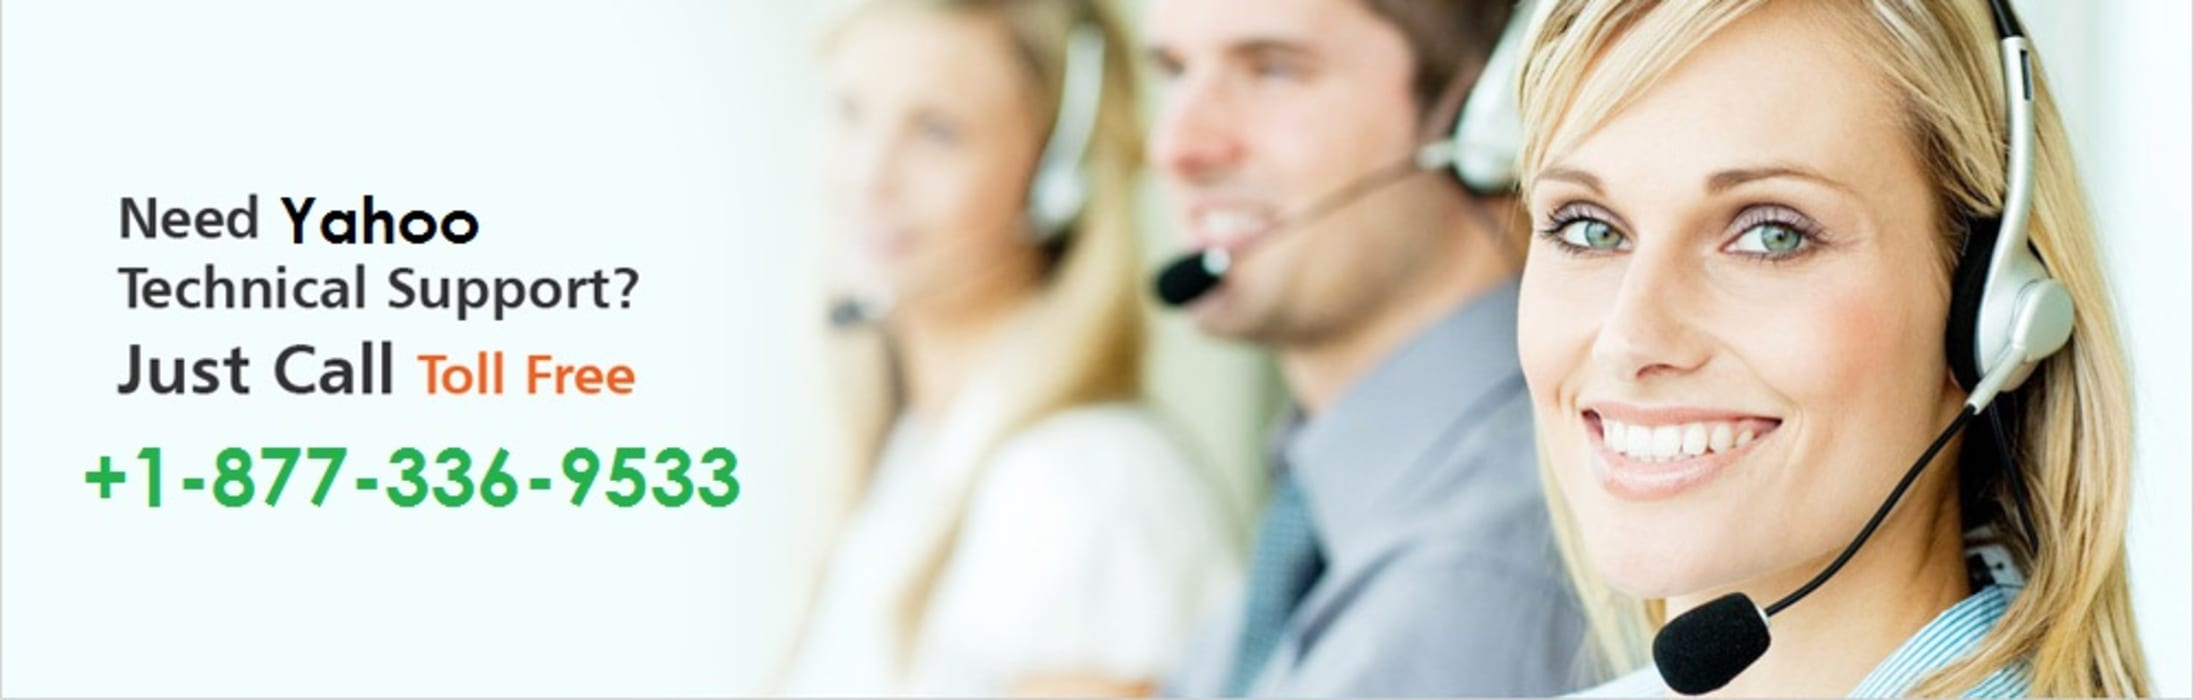 Yahoo Helpline Number +1-877-336-9533:  Office buildings by Yahoo Mail Customer Support Number +1-877-336-9533